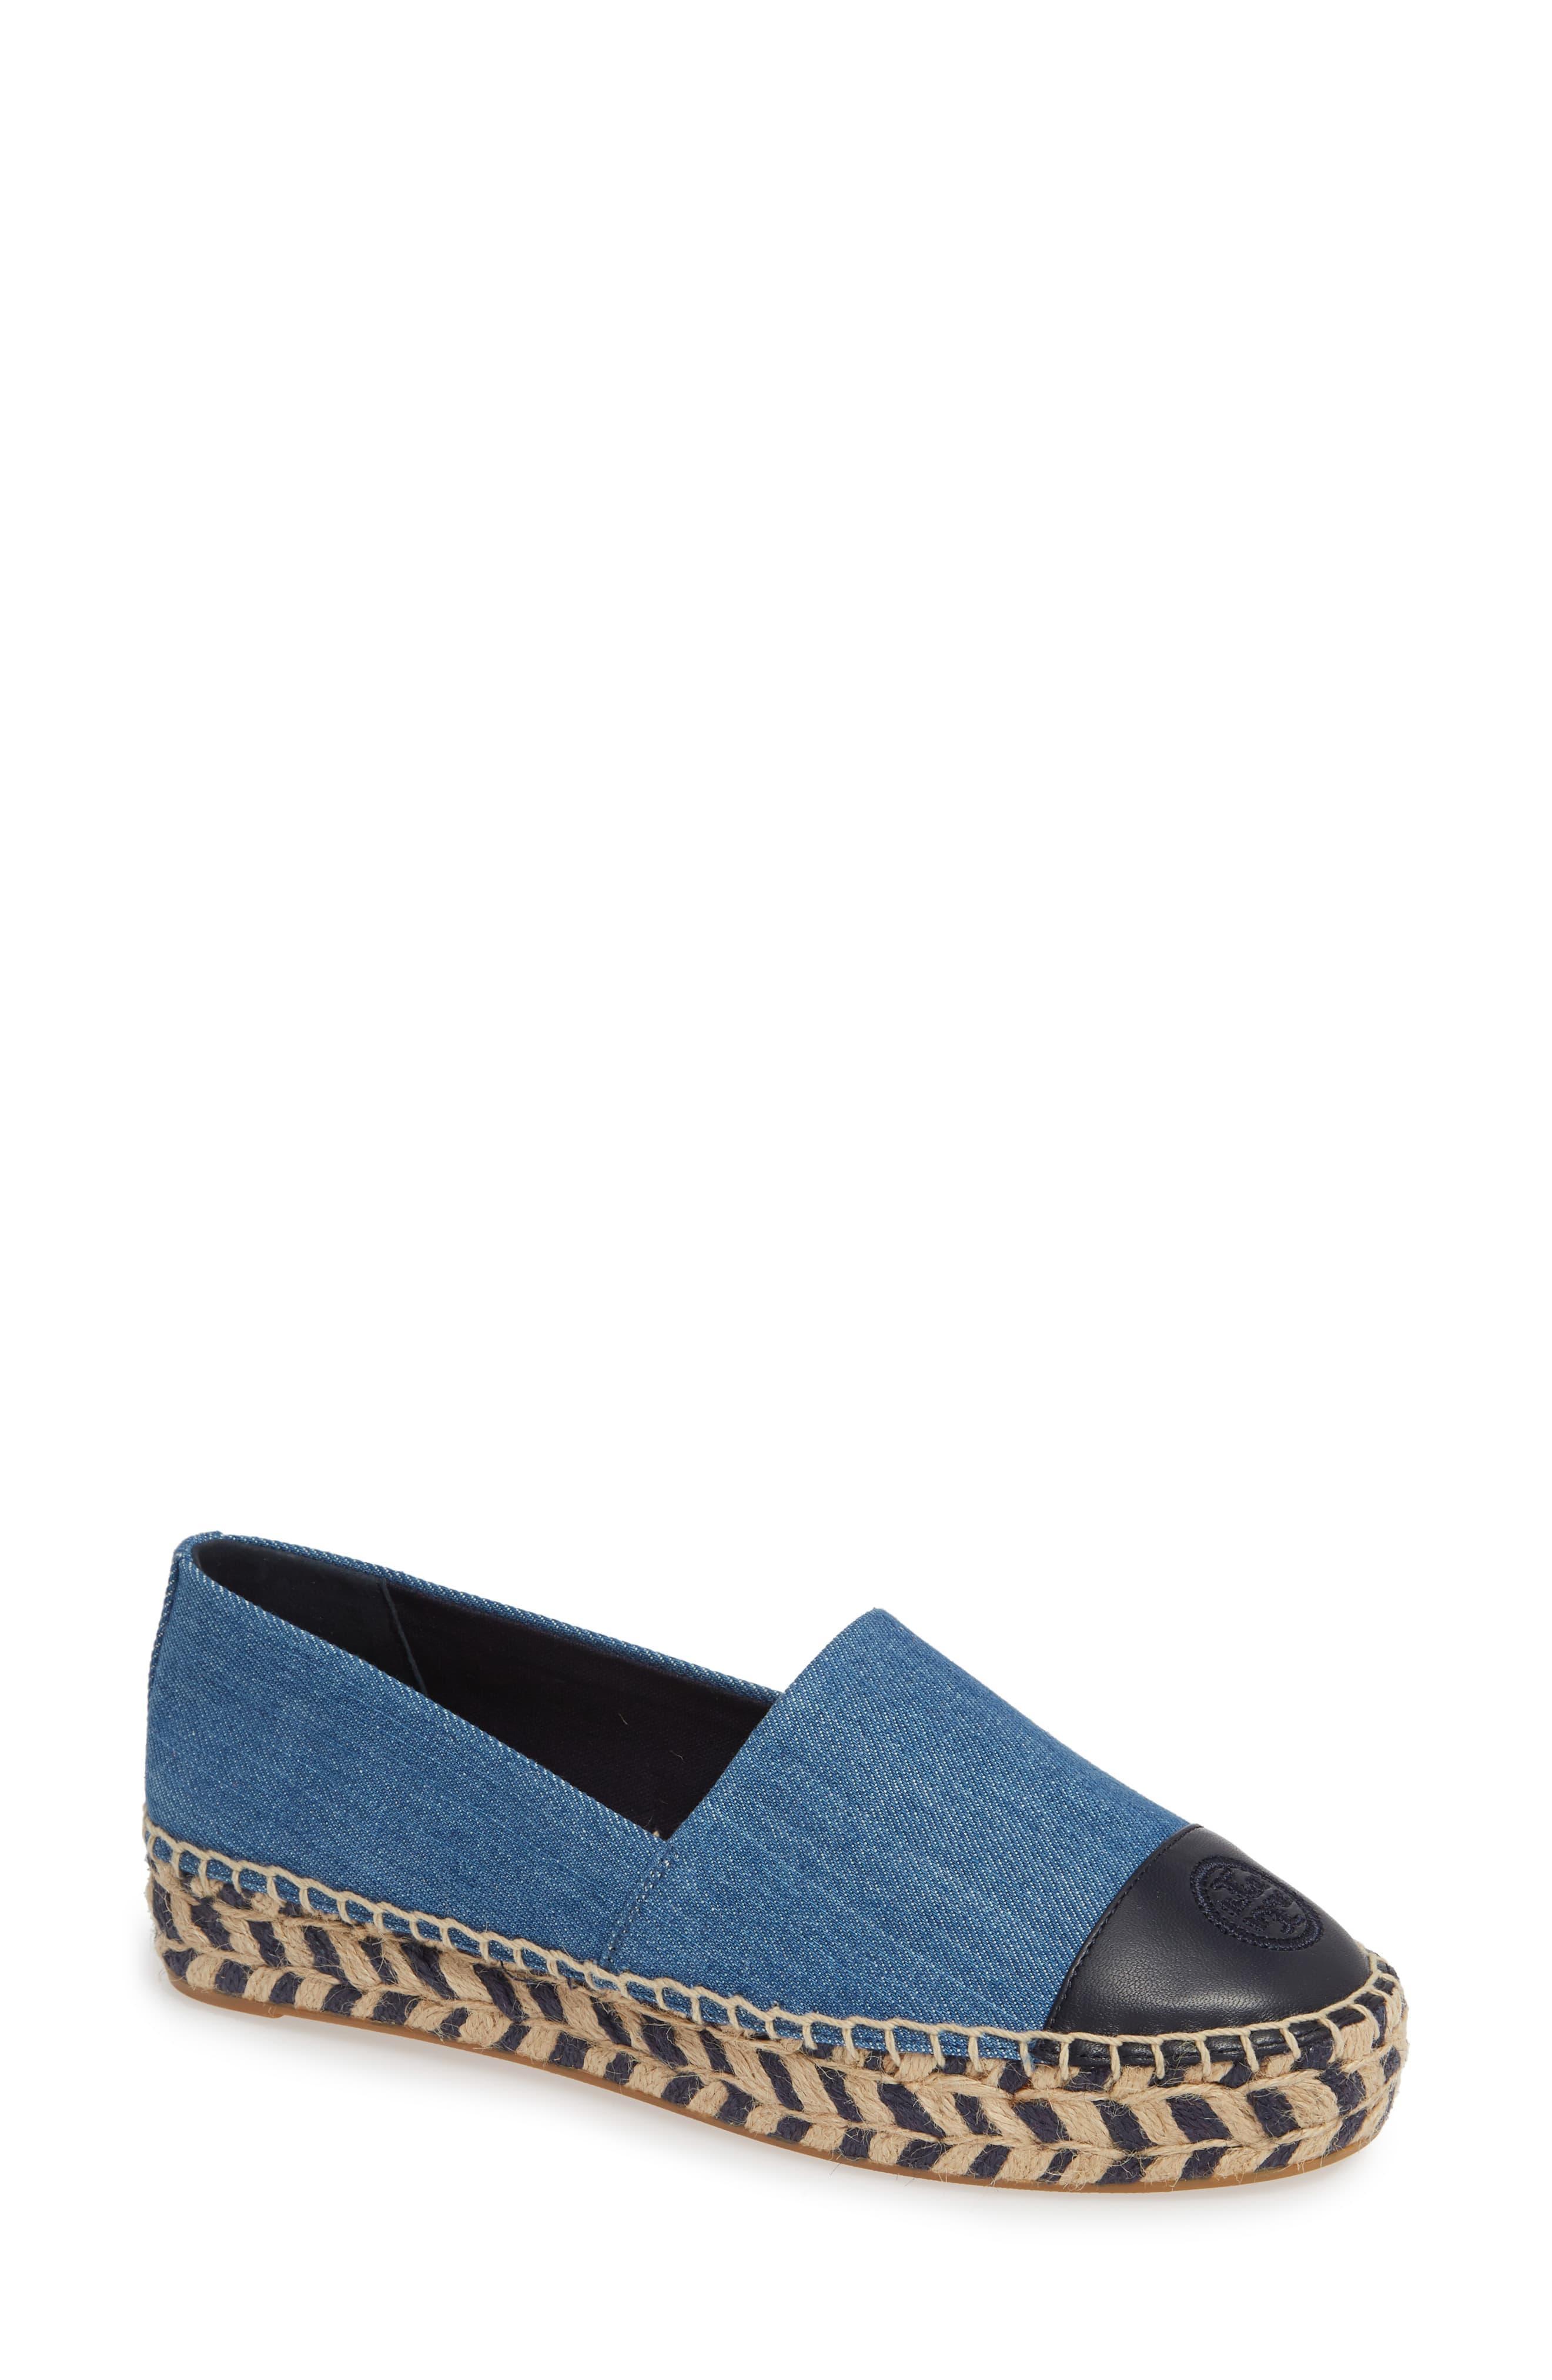 USA STOCK New Women canvas Flat Espadrille Denim Floral Blue